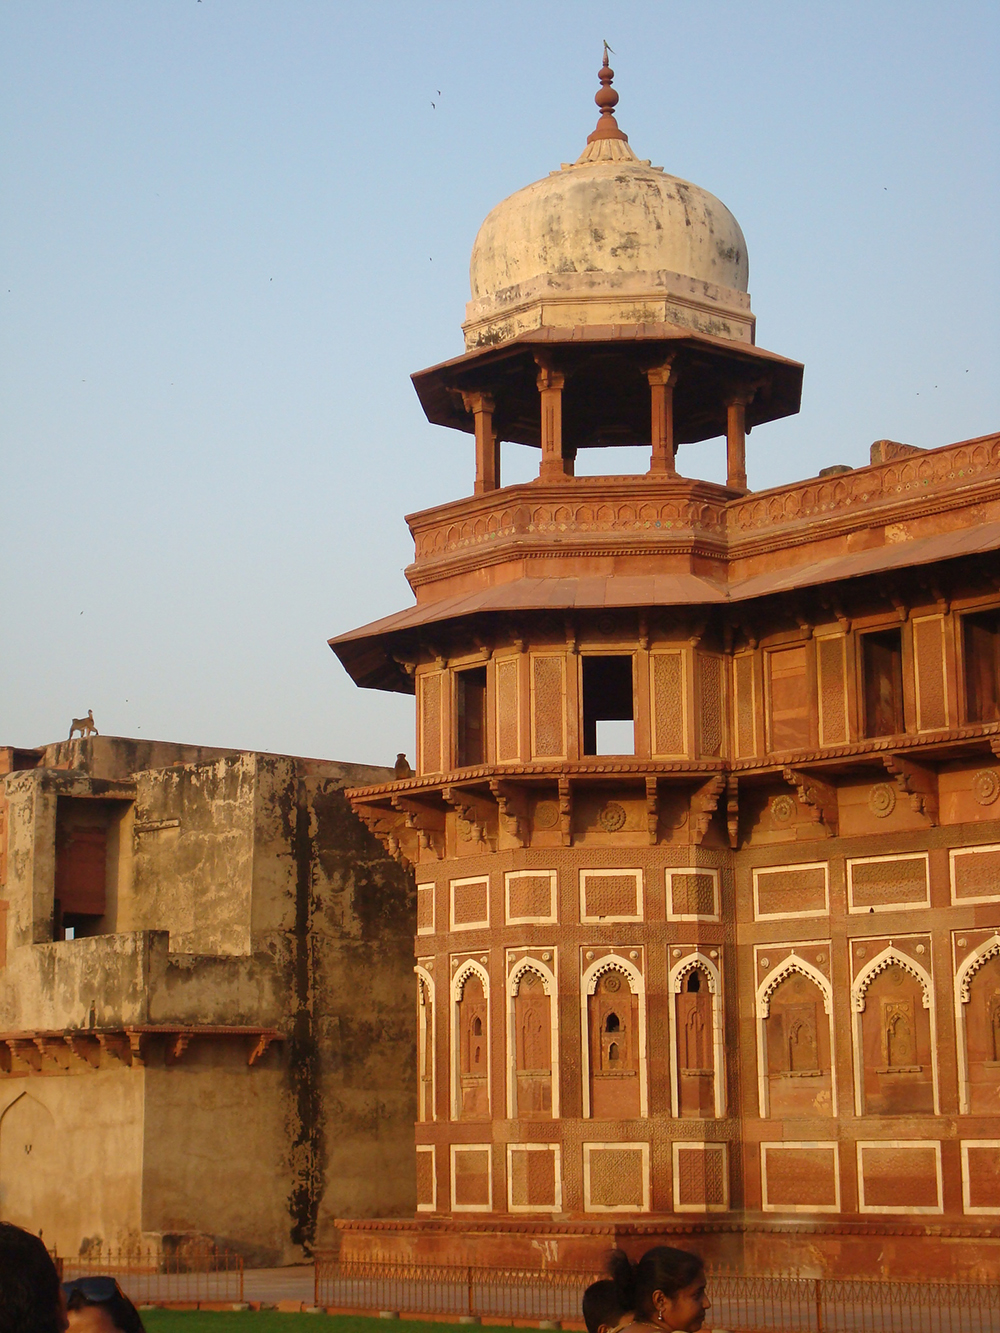 Outer walls of the Taj Mahal